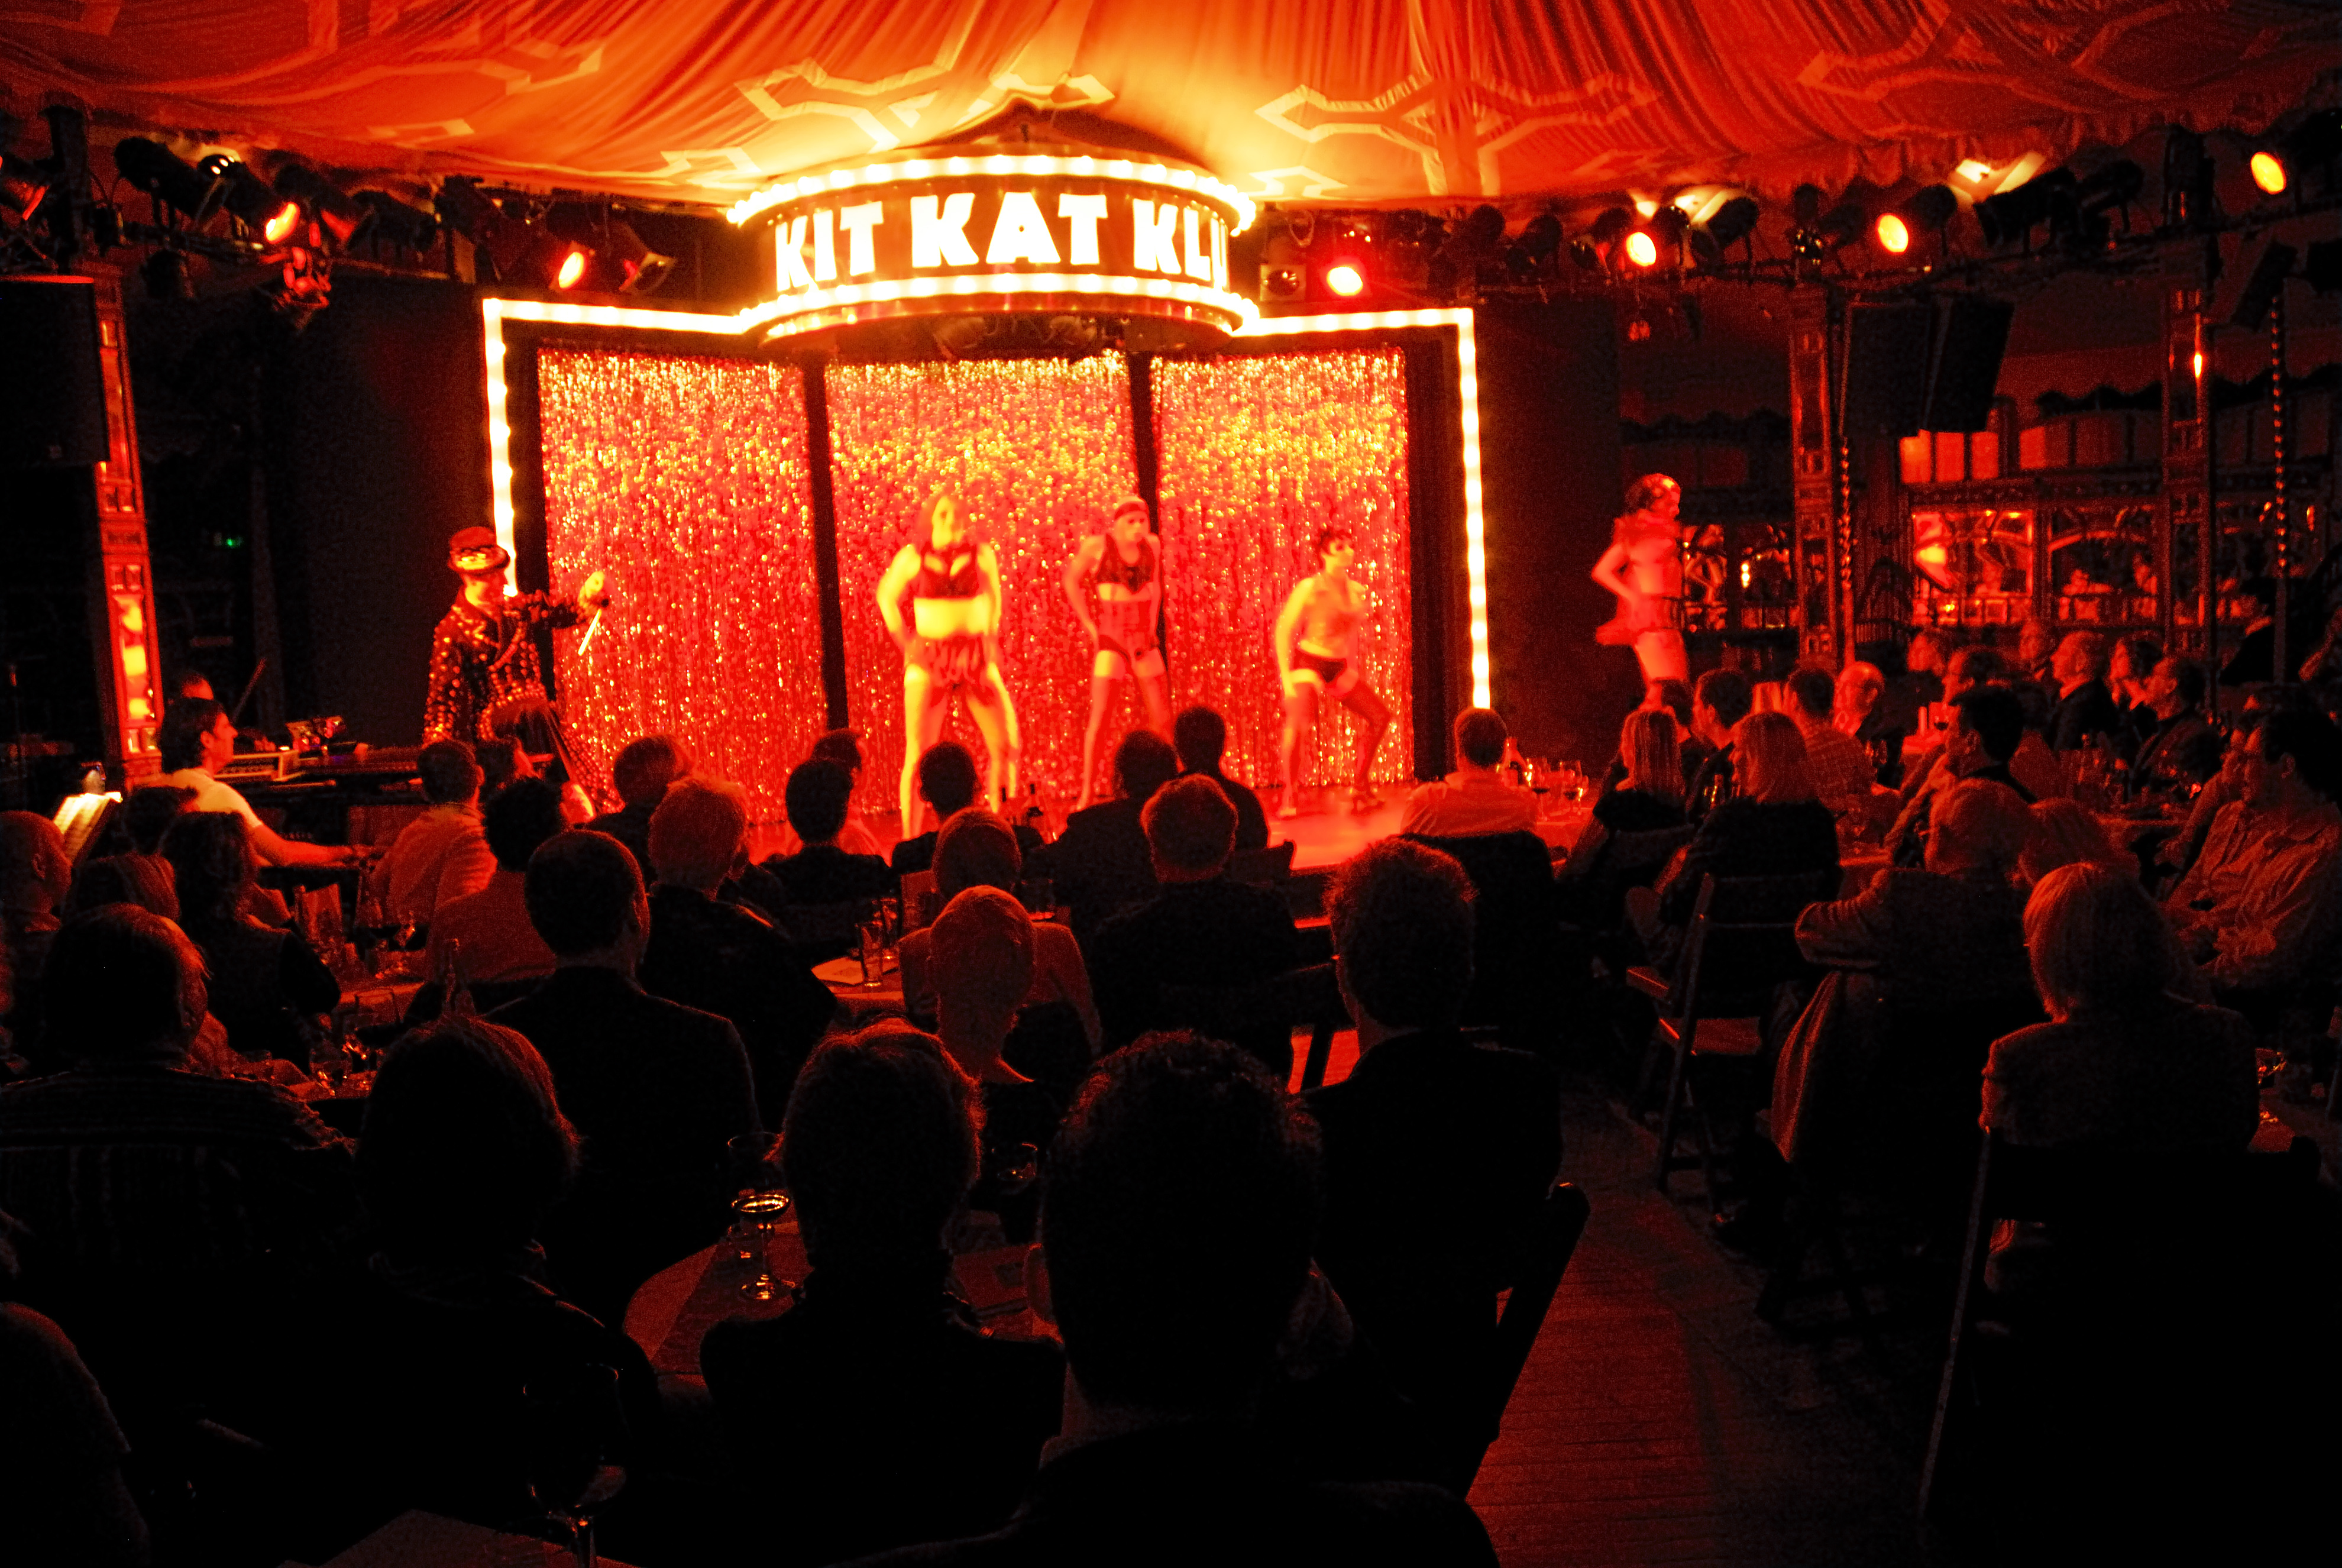 KitKatClub   Berlin, Germany Nightlife - Lonely Planet